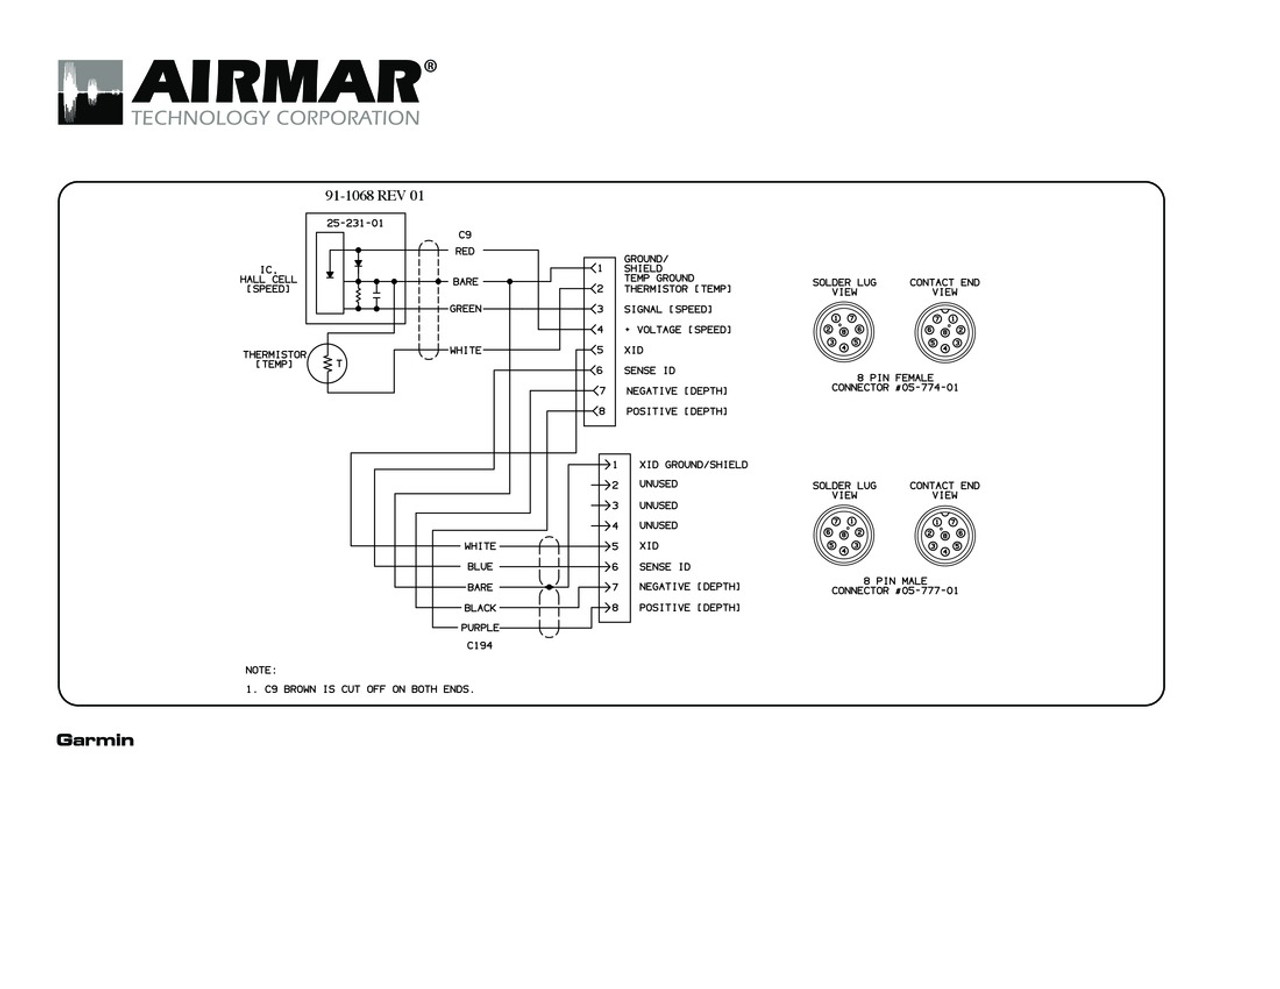 Airmar Wiring Diagram Garmin St850 8 Pin (s,t) Blue Bottle Marine Delphi  28173908 Radio Wiring Diagram Garmin Marine Wiring Diagram